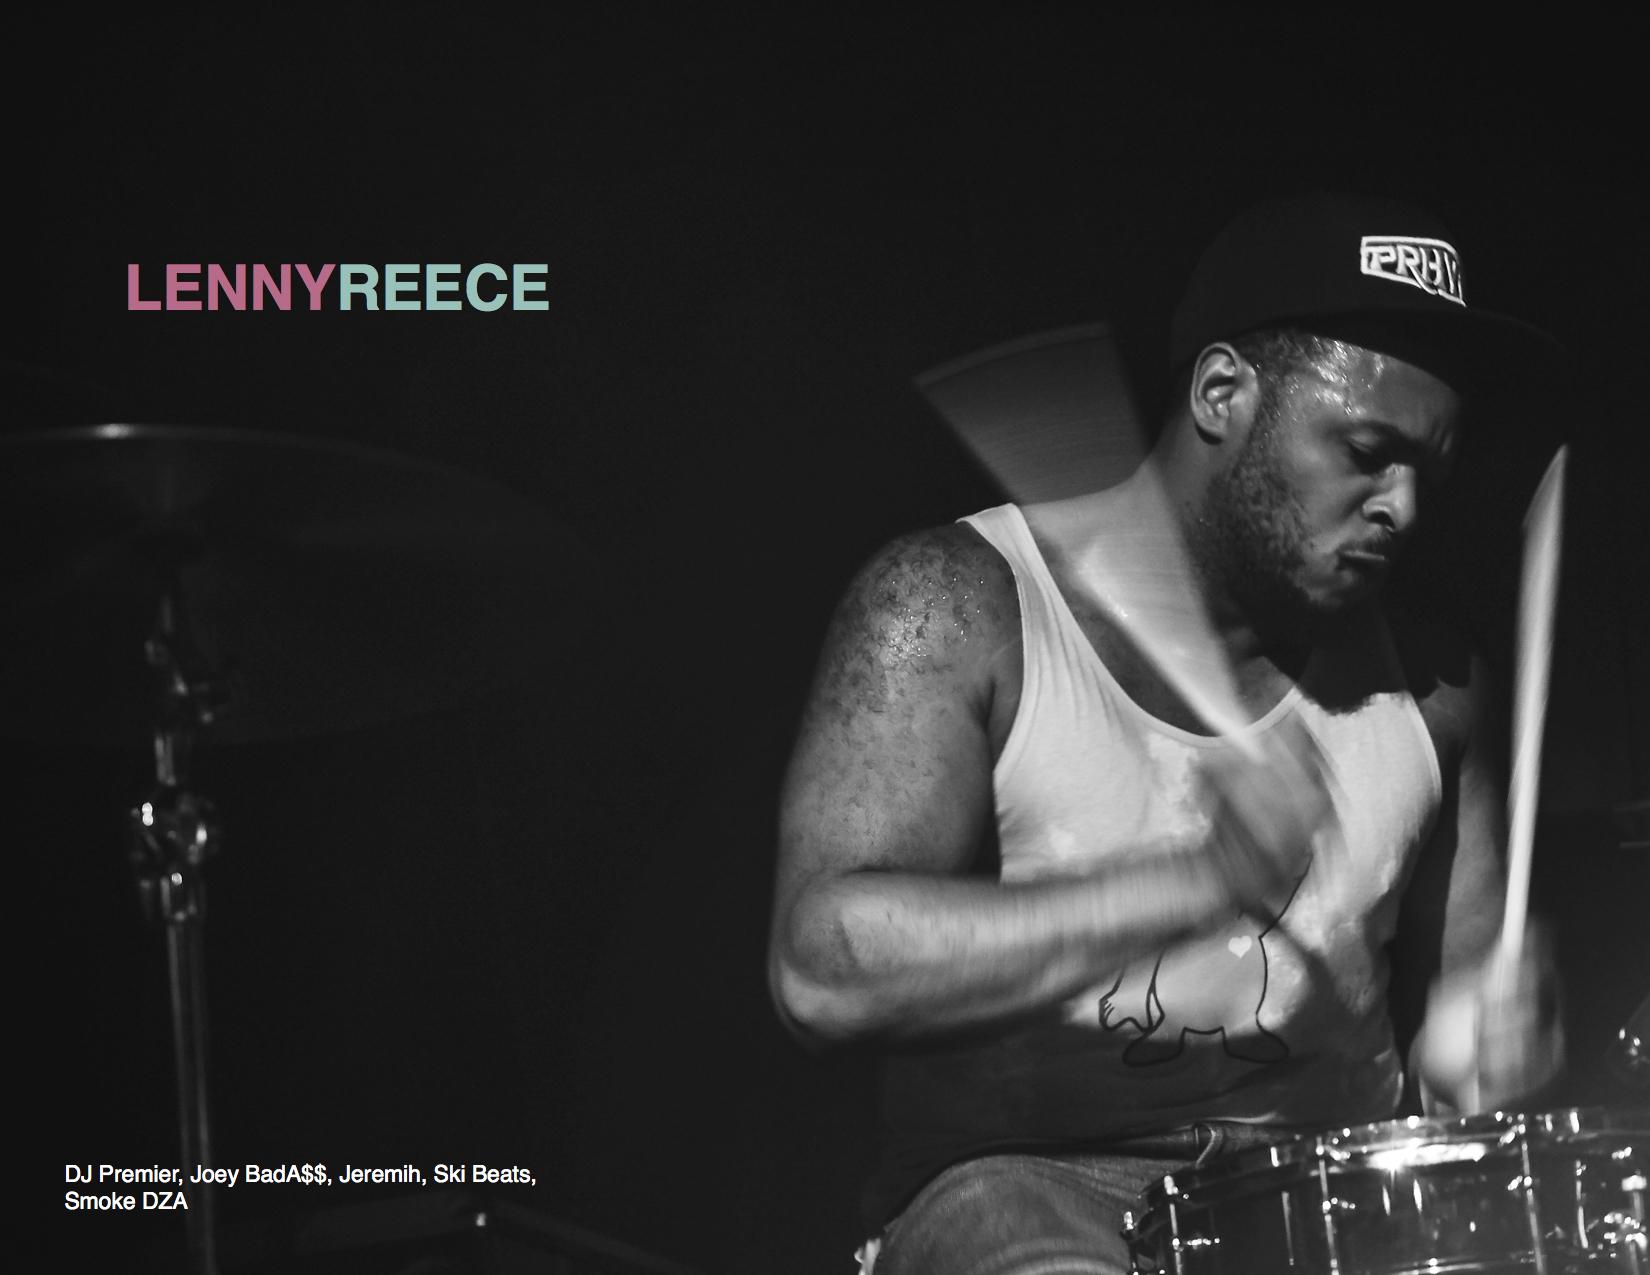 Lenny.jpg